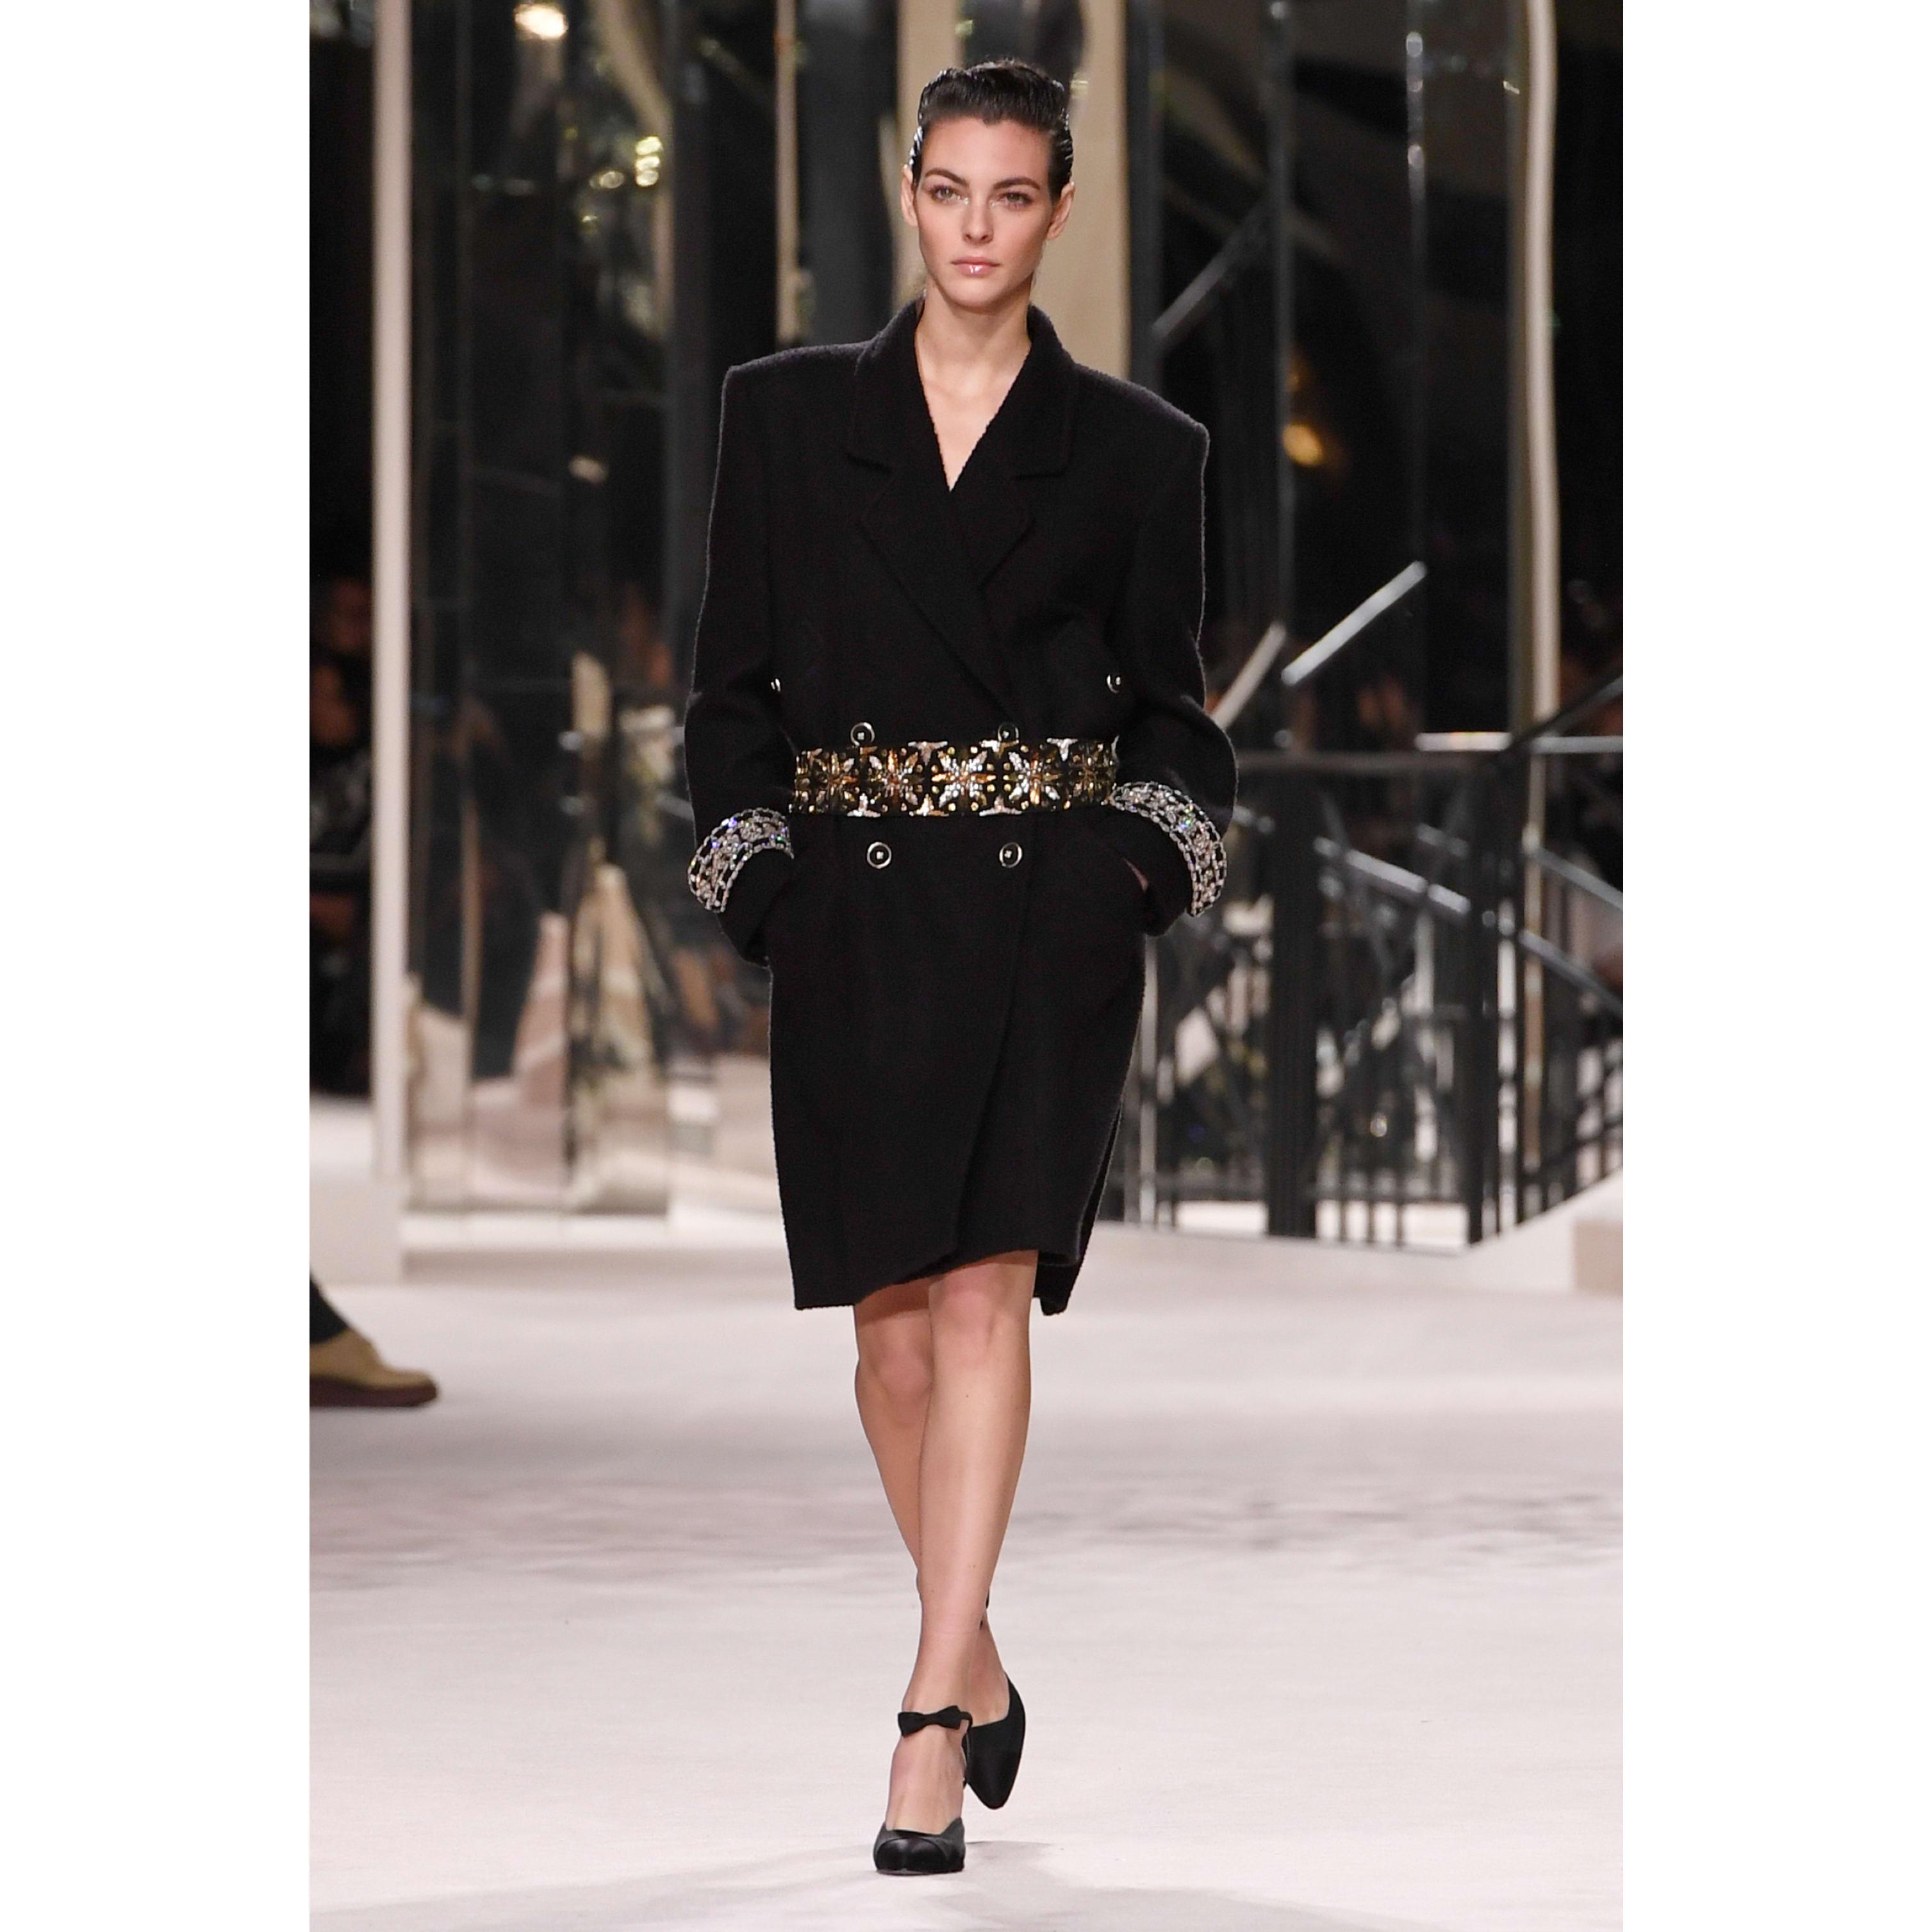 Casaco - Black - Embroidered Wool & Cashmere Tweed - CHANEL - Vista predefinida - ver a versão em tamanho standard